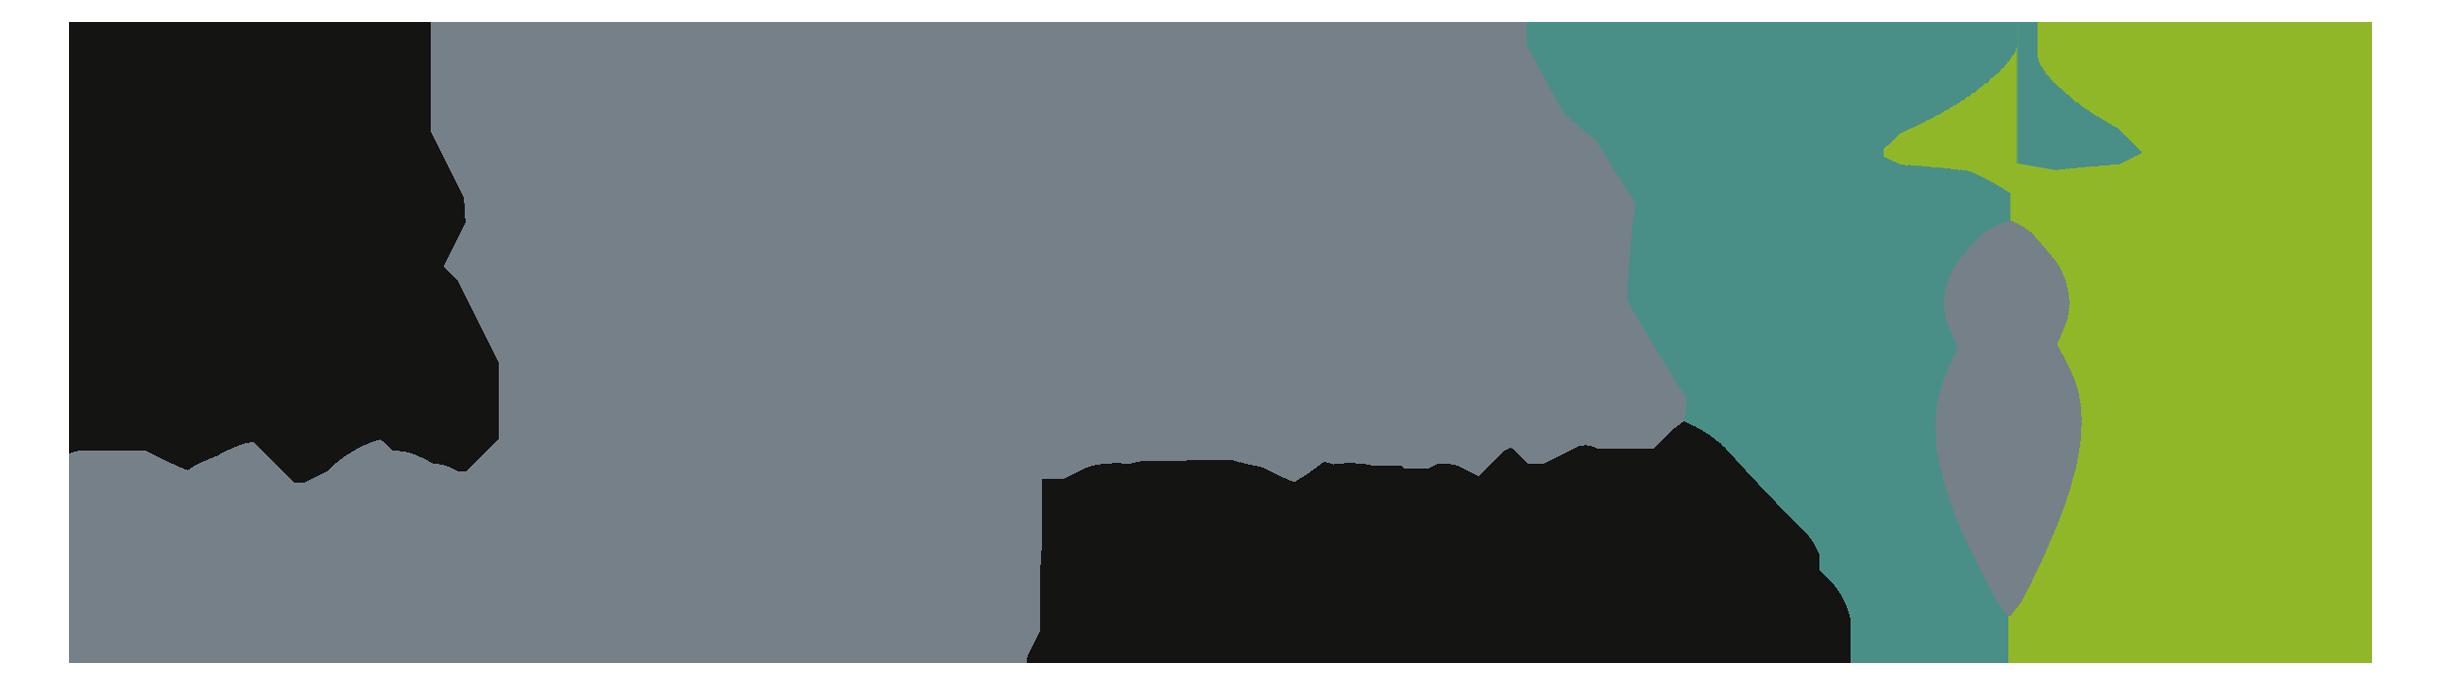 Ordination Dr. Novak | Corona Test